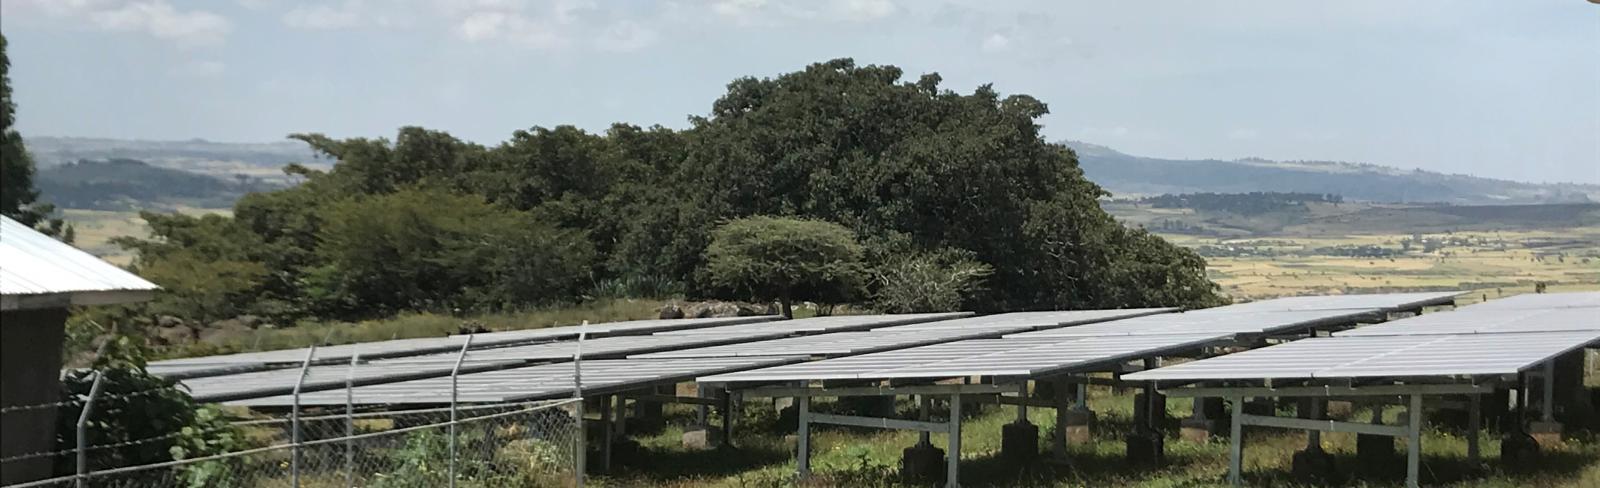 Ethiopia National Off-grid Electrification Forum